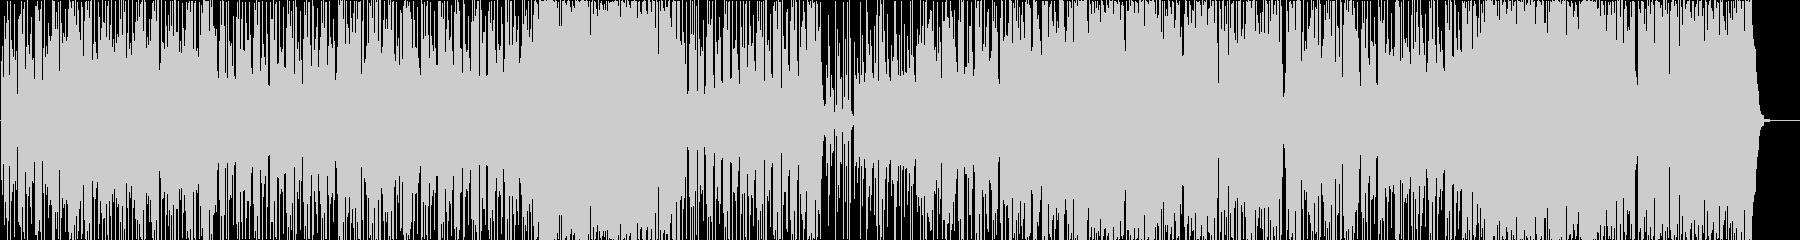 AMの未再生の波形